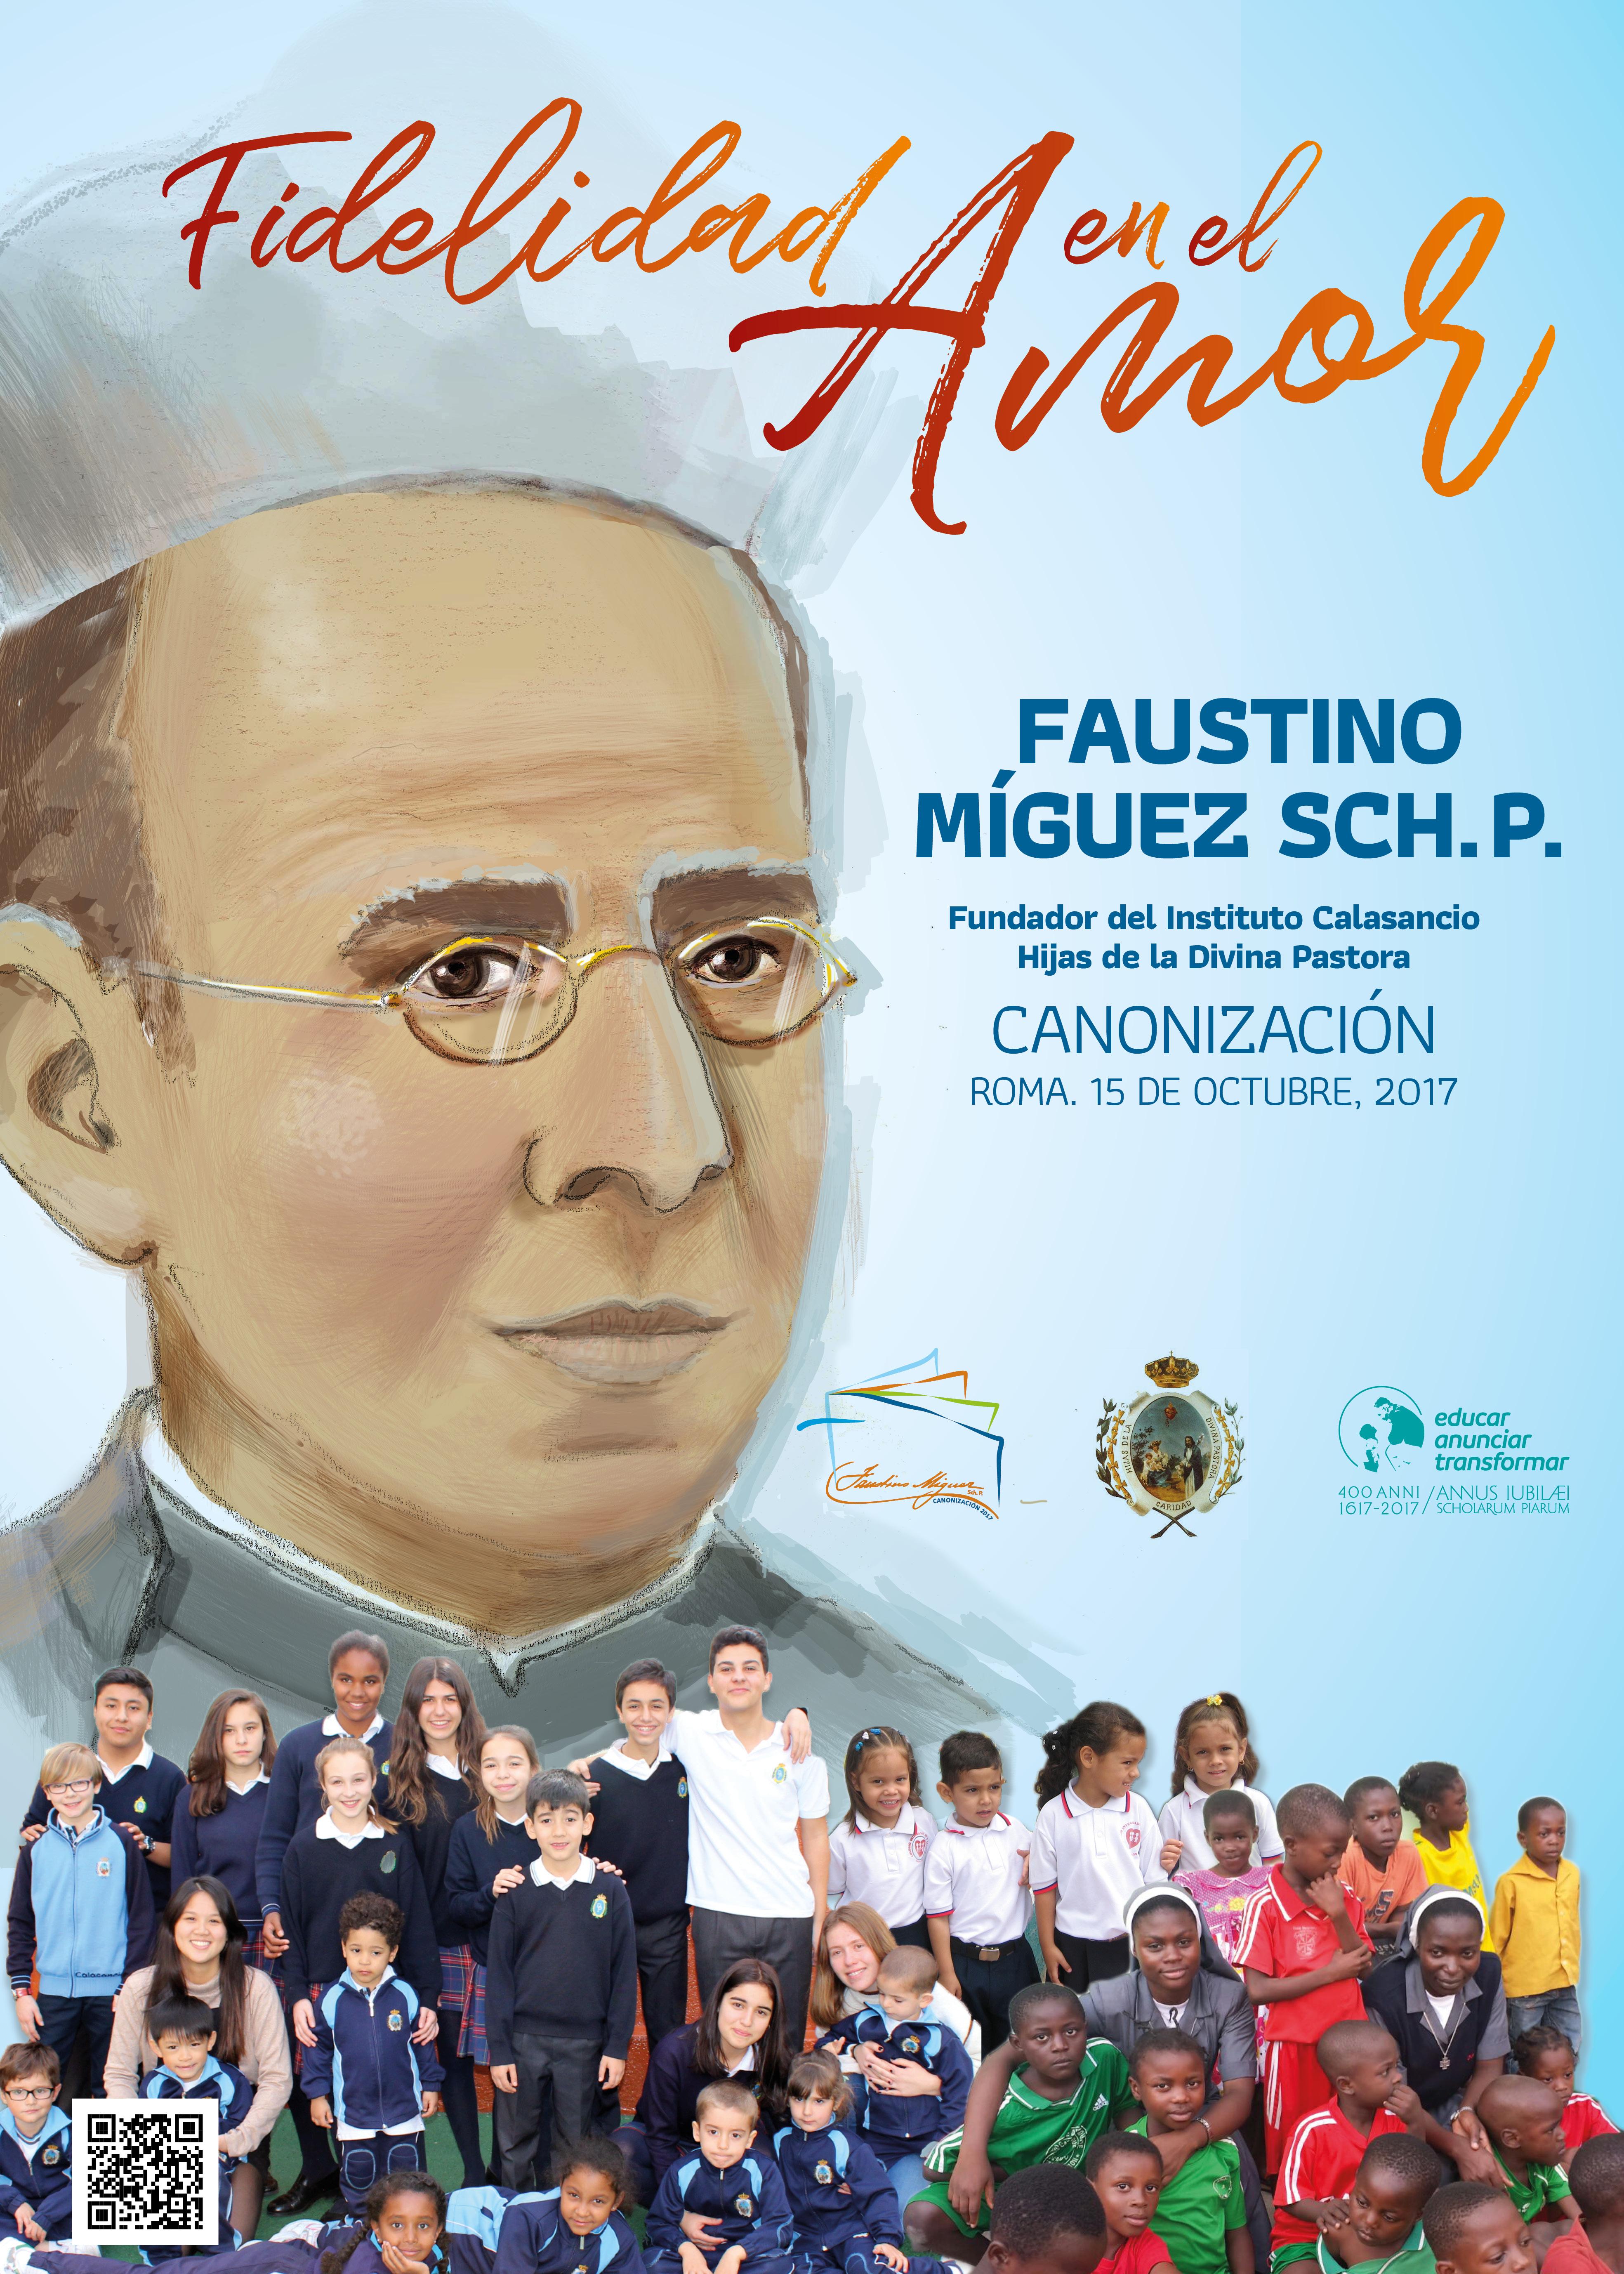 P. Faustino Míguez